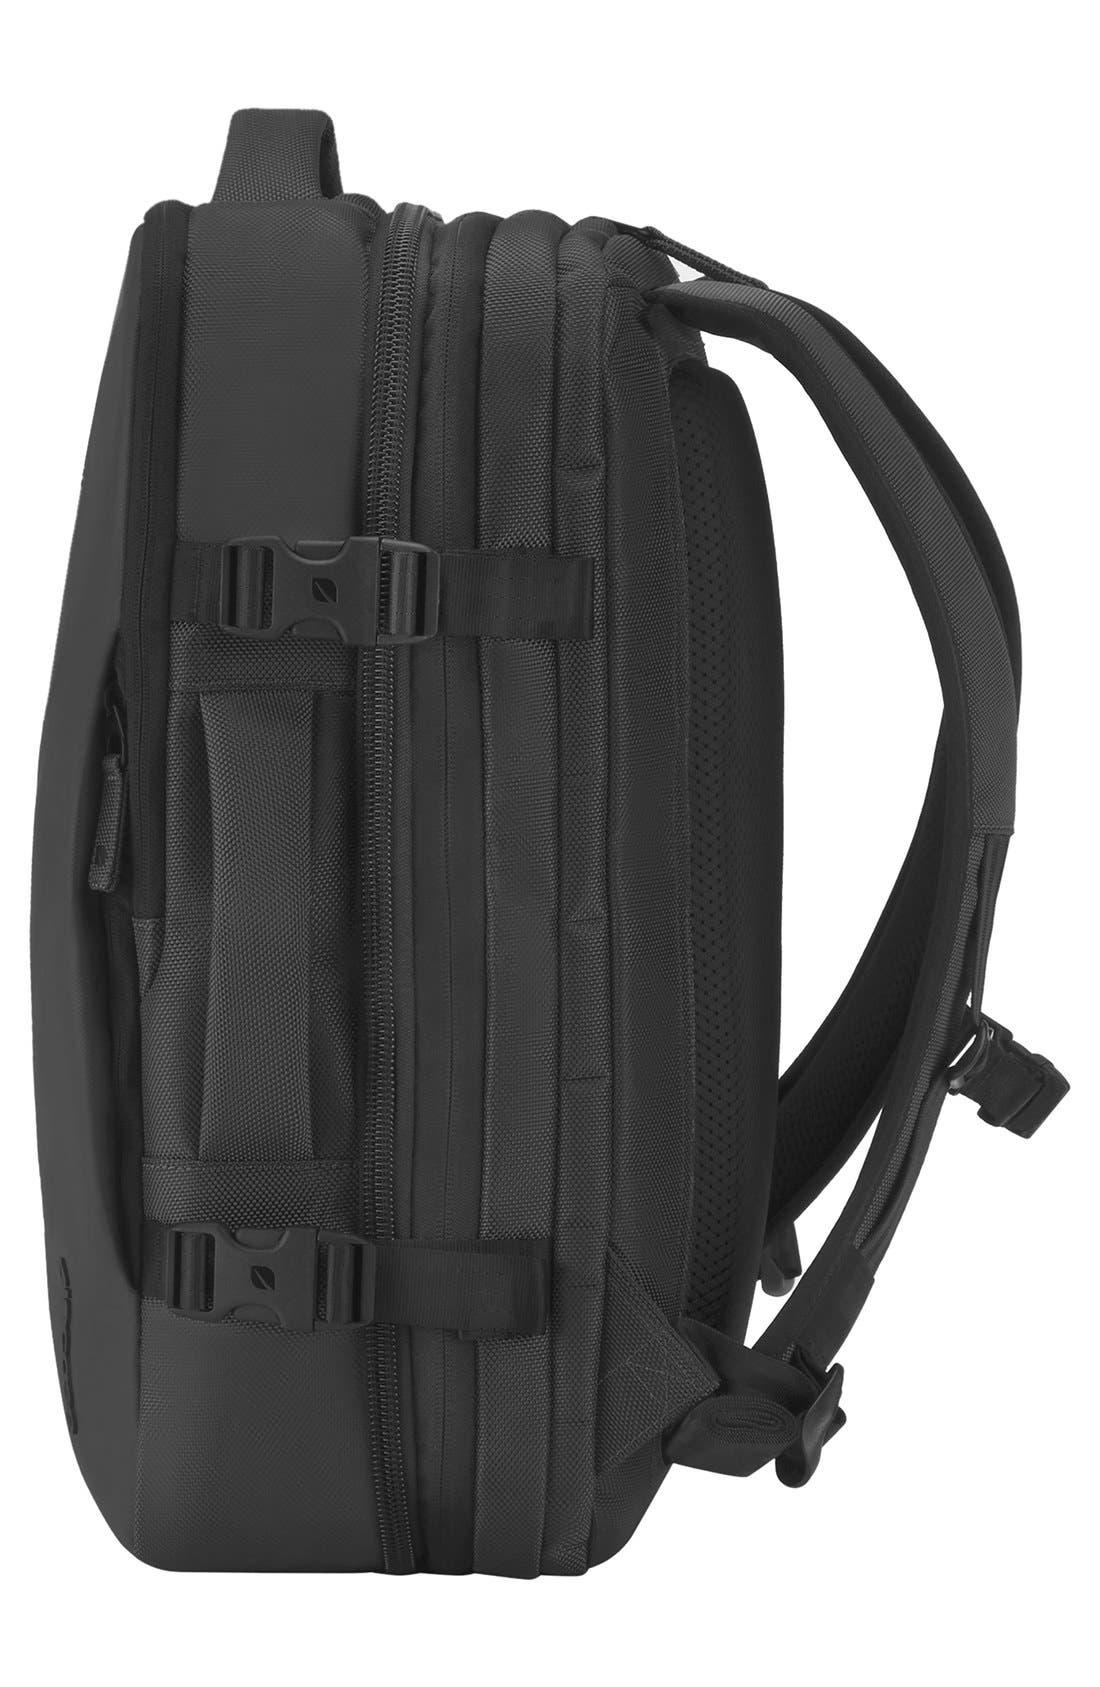 VIA Backpack,                             Alternate thumbnail 2, color,                             001